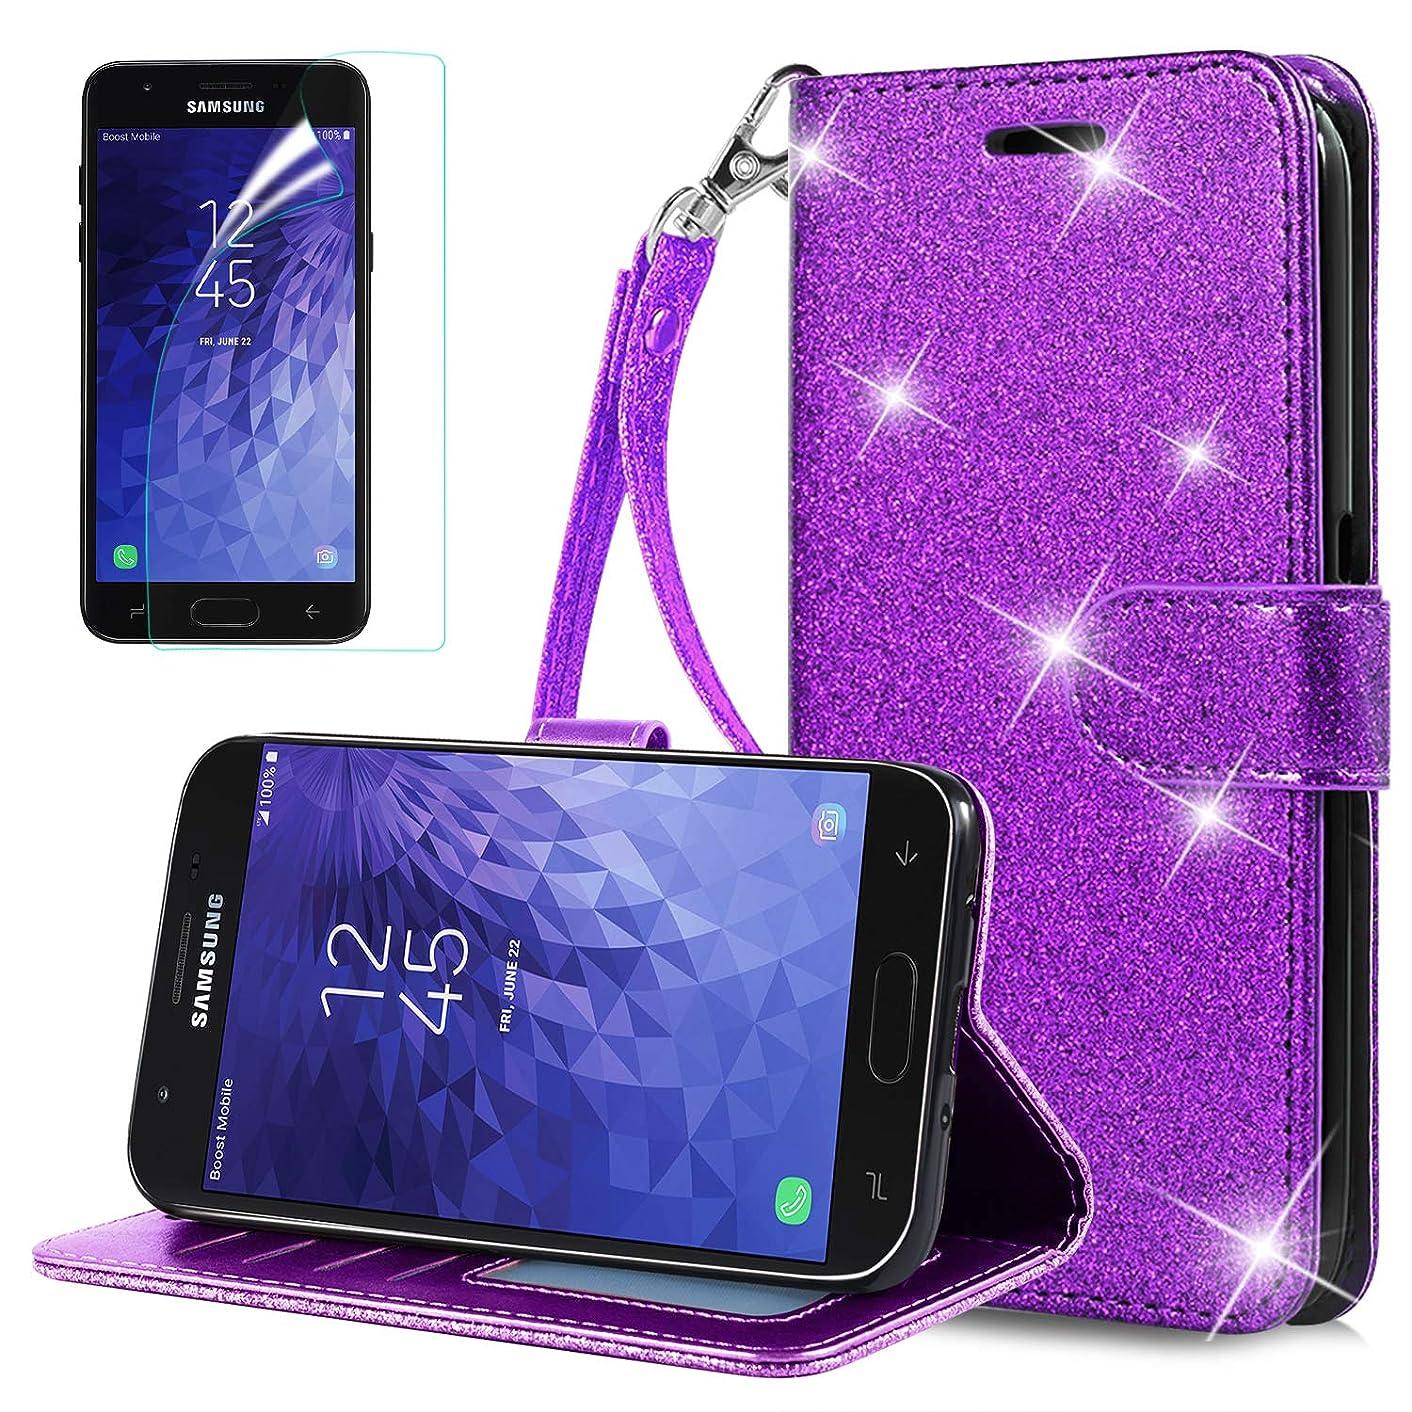 Jemo for Samsung Galaxy J7 Crown Case Galaxy J7 Refine/J7 2018/J7 Star/J7 V 2rd Gen Phone Case Kickstand Wrist Strap for Girls Women, Purple